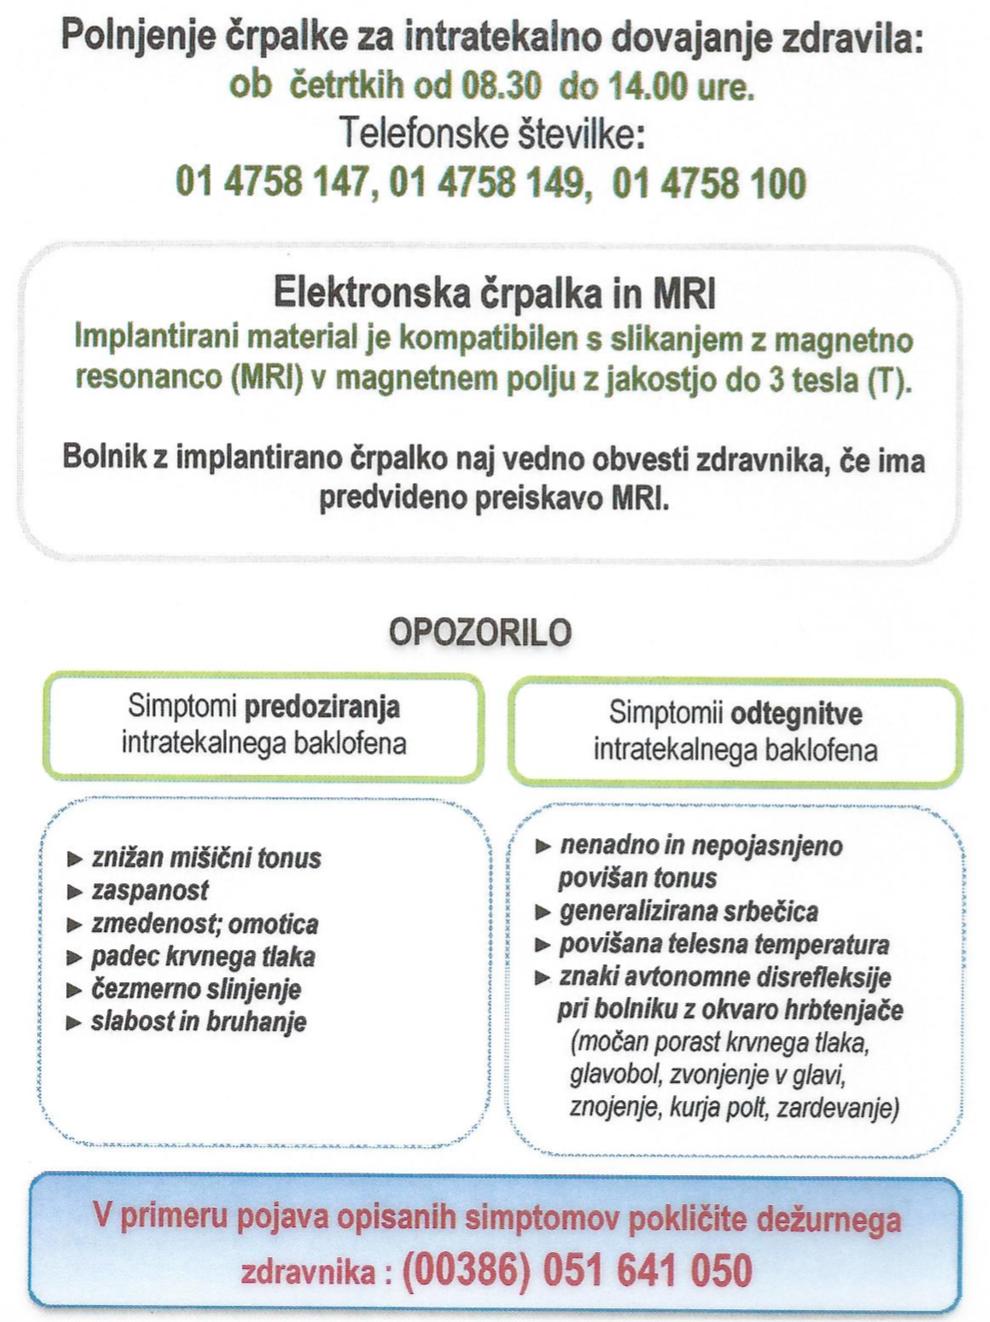 Informacije za paciente, URI-Soča.